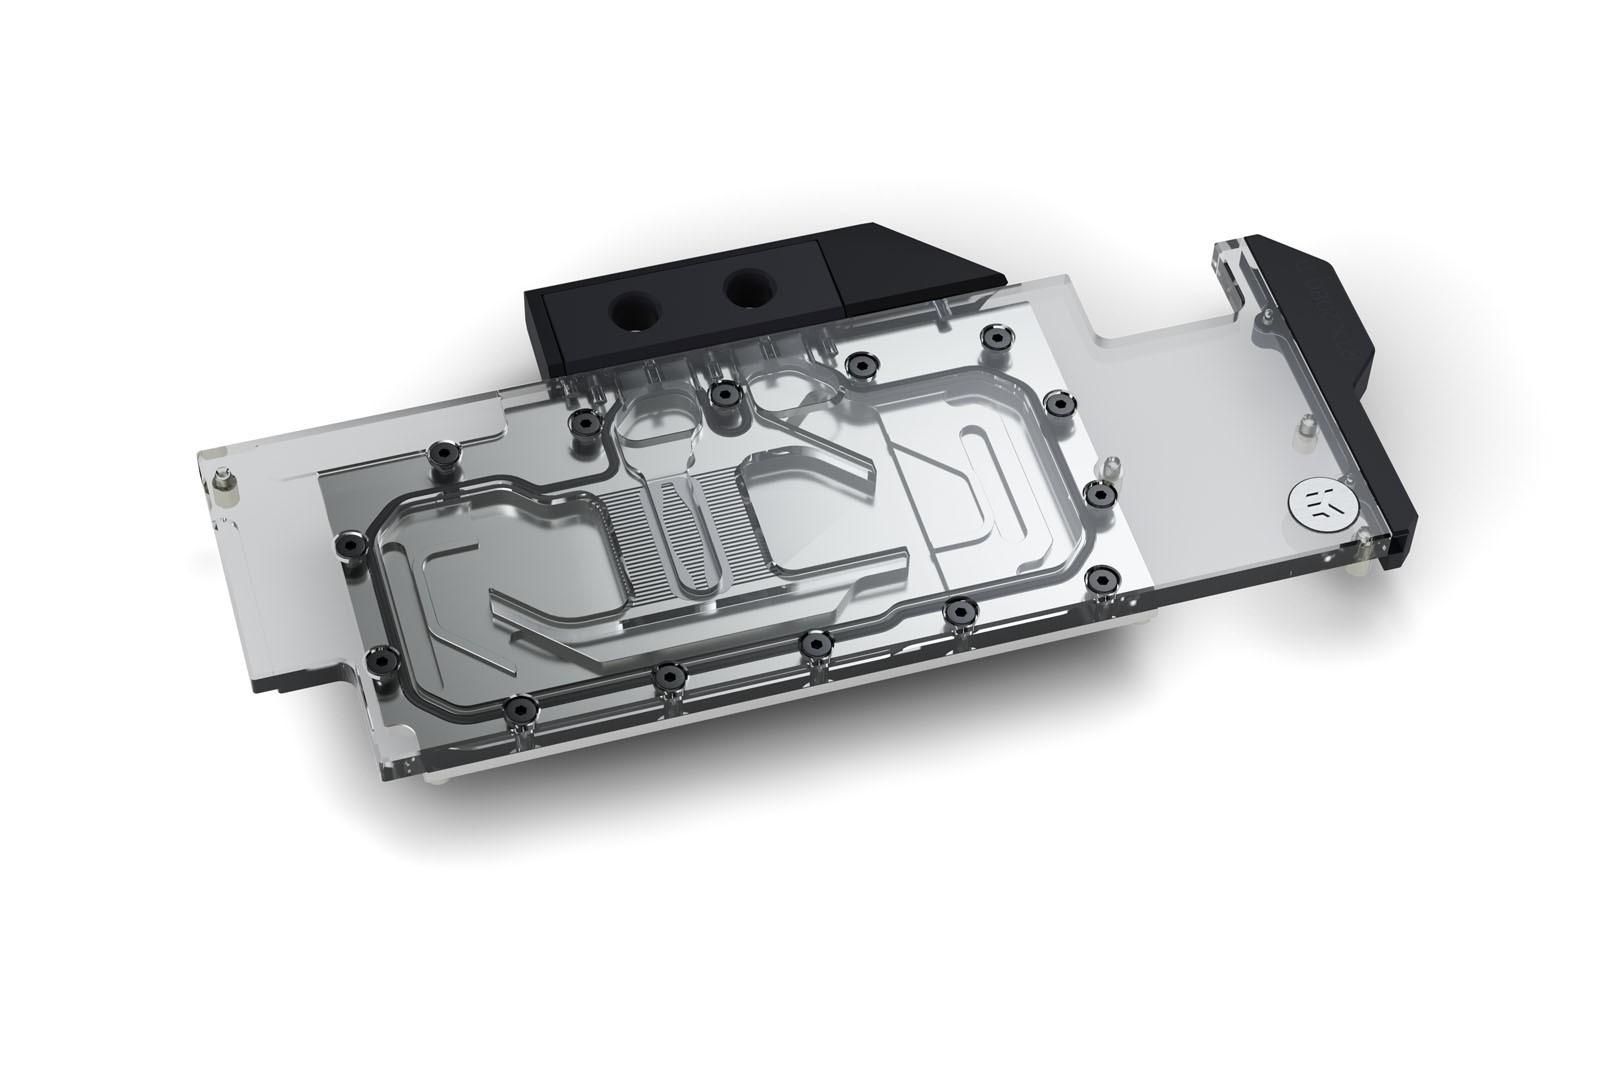 List of compatible water blocks   NVIDIA Titan RTX, 24GB